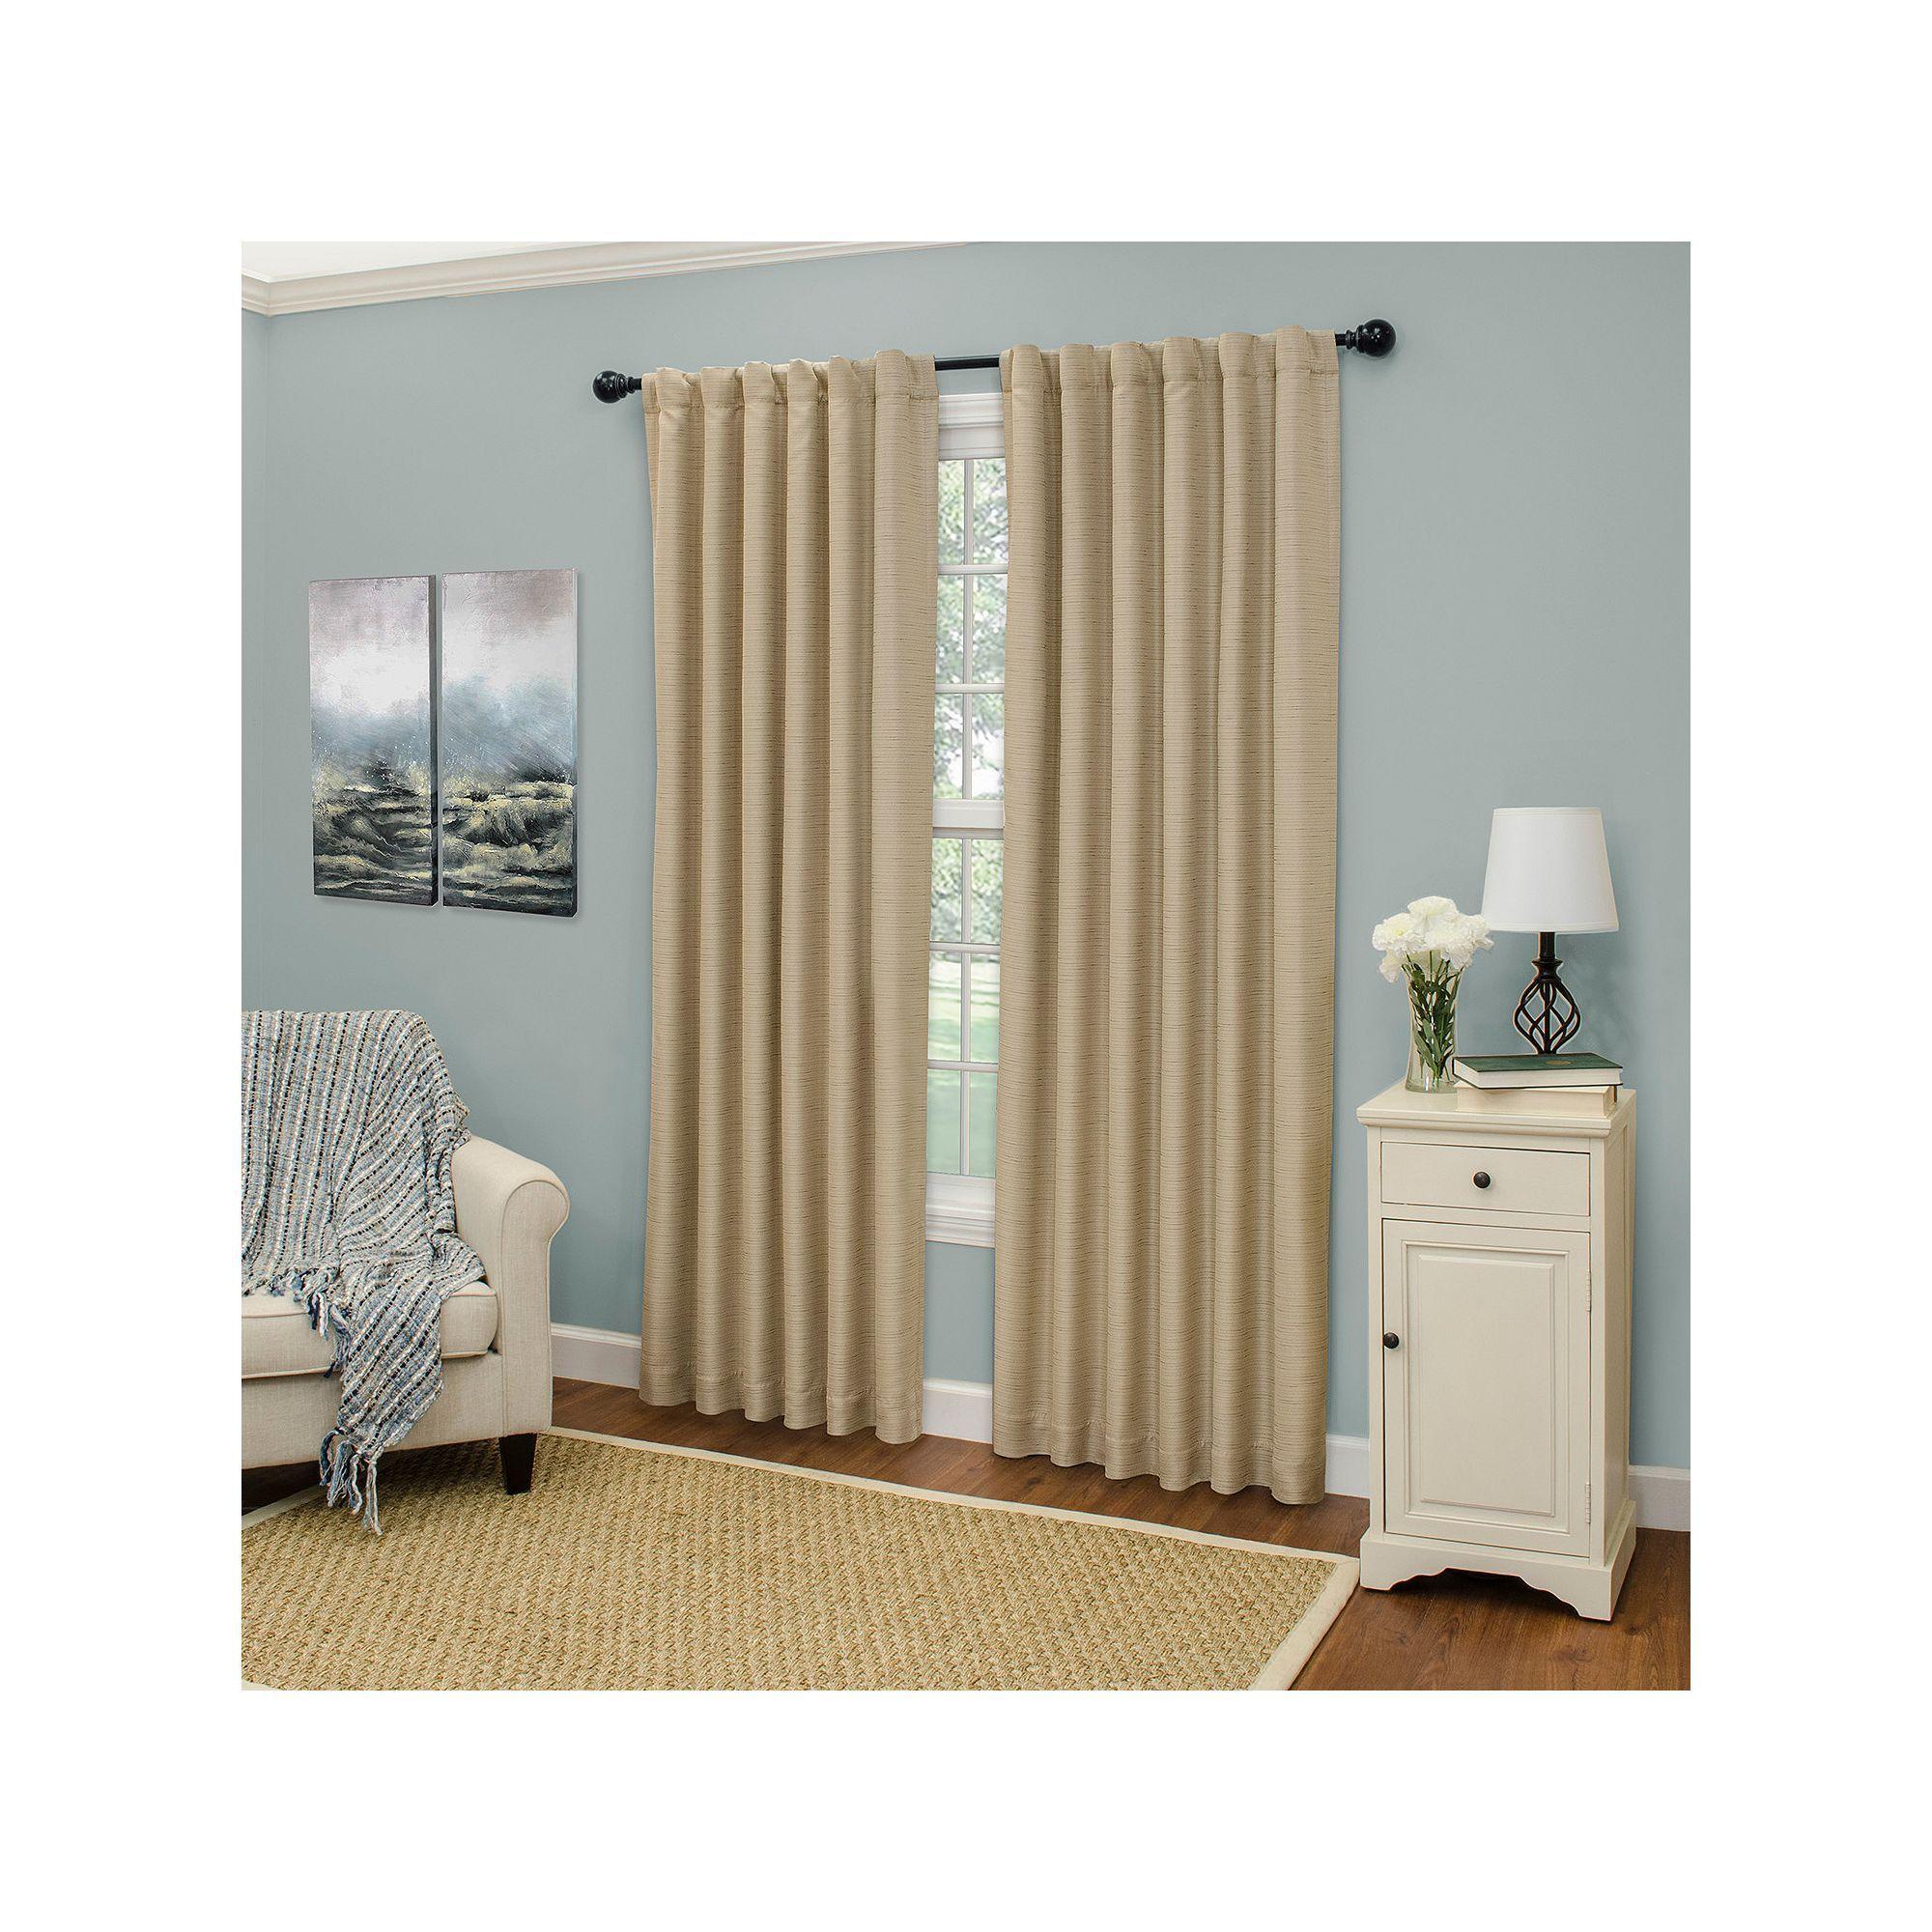 Eclipse Cromwell Thermaweave Window Curtain, Beig/Green (Beig/Khaki)